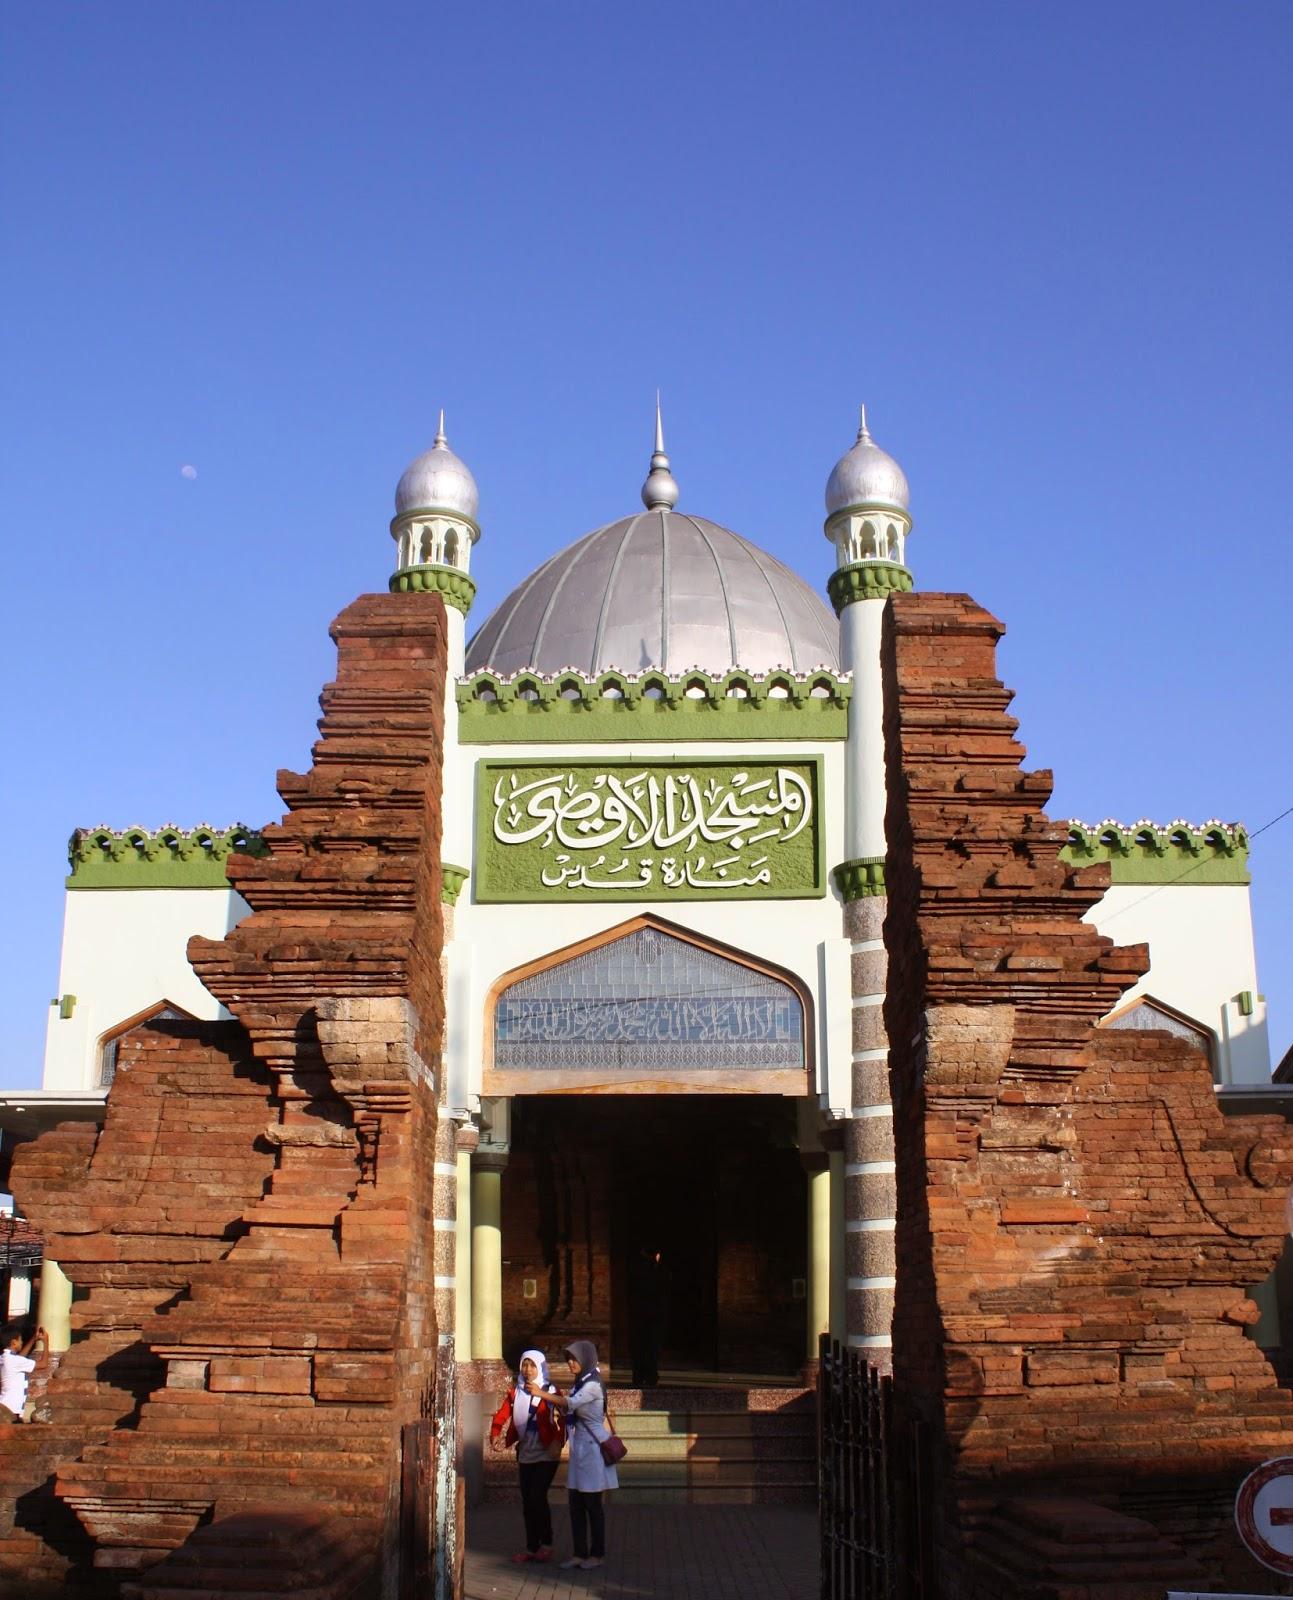 Kudus Indonesia  city photos gallery : Masjid Menara Kudus Kudus Jawa Tengah GPS Wisata Indonesia